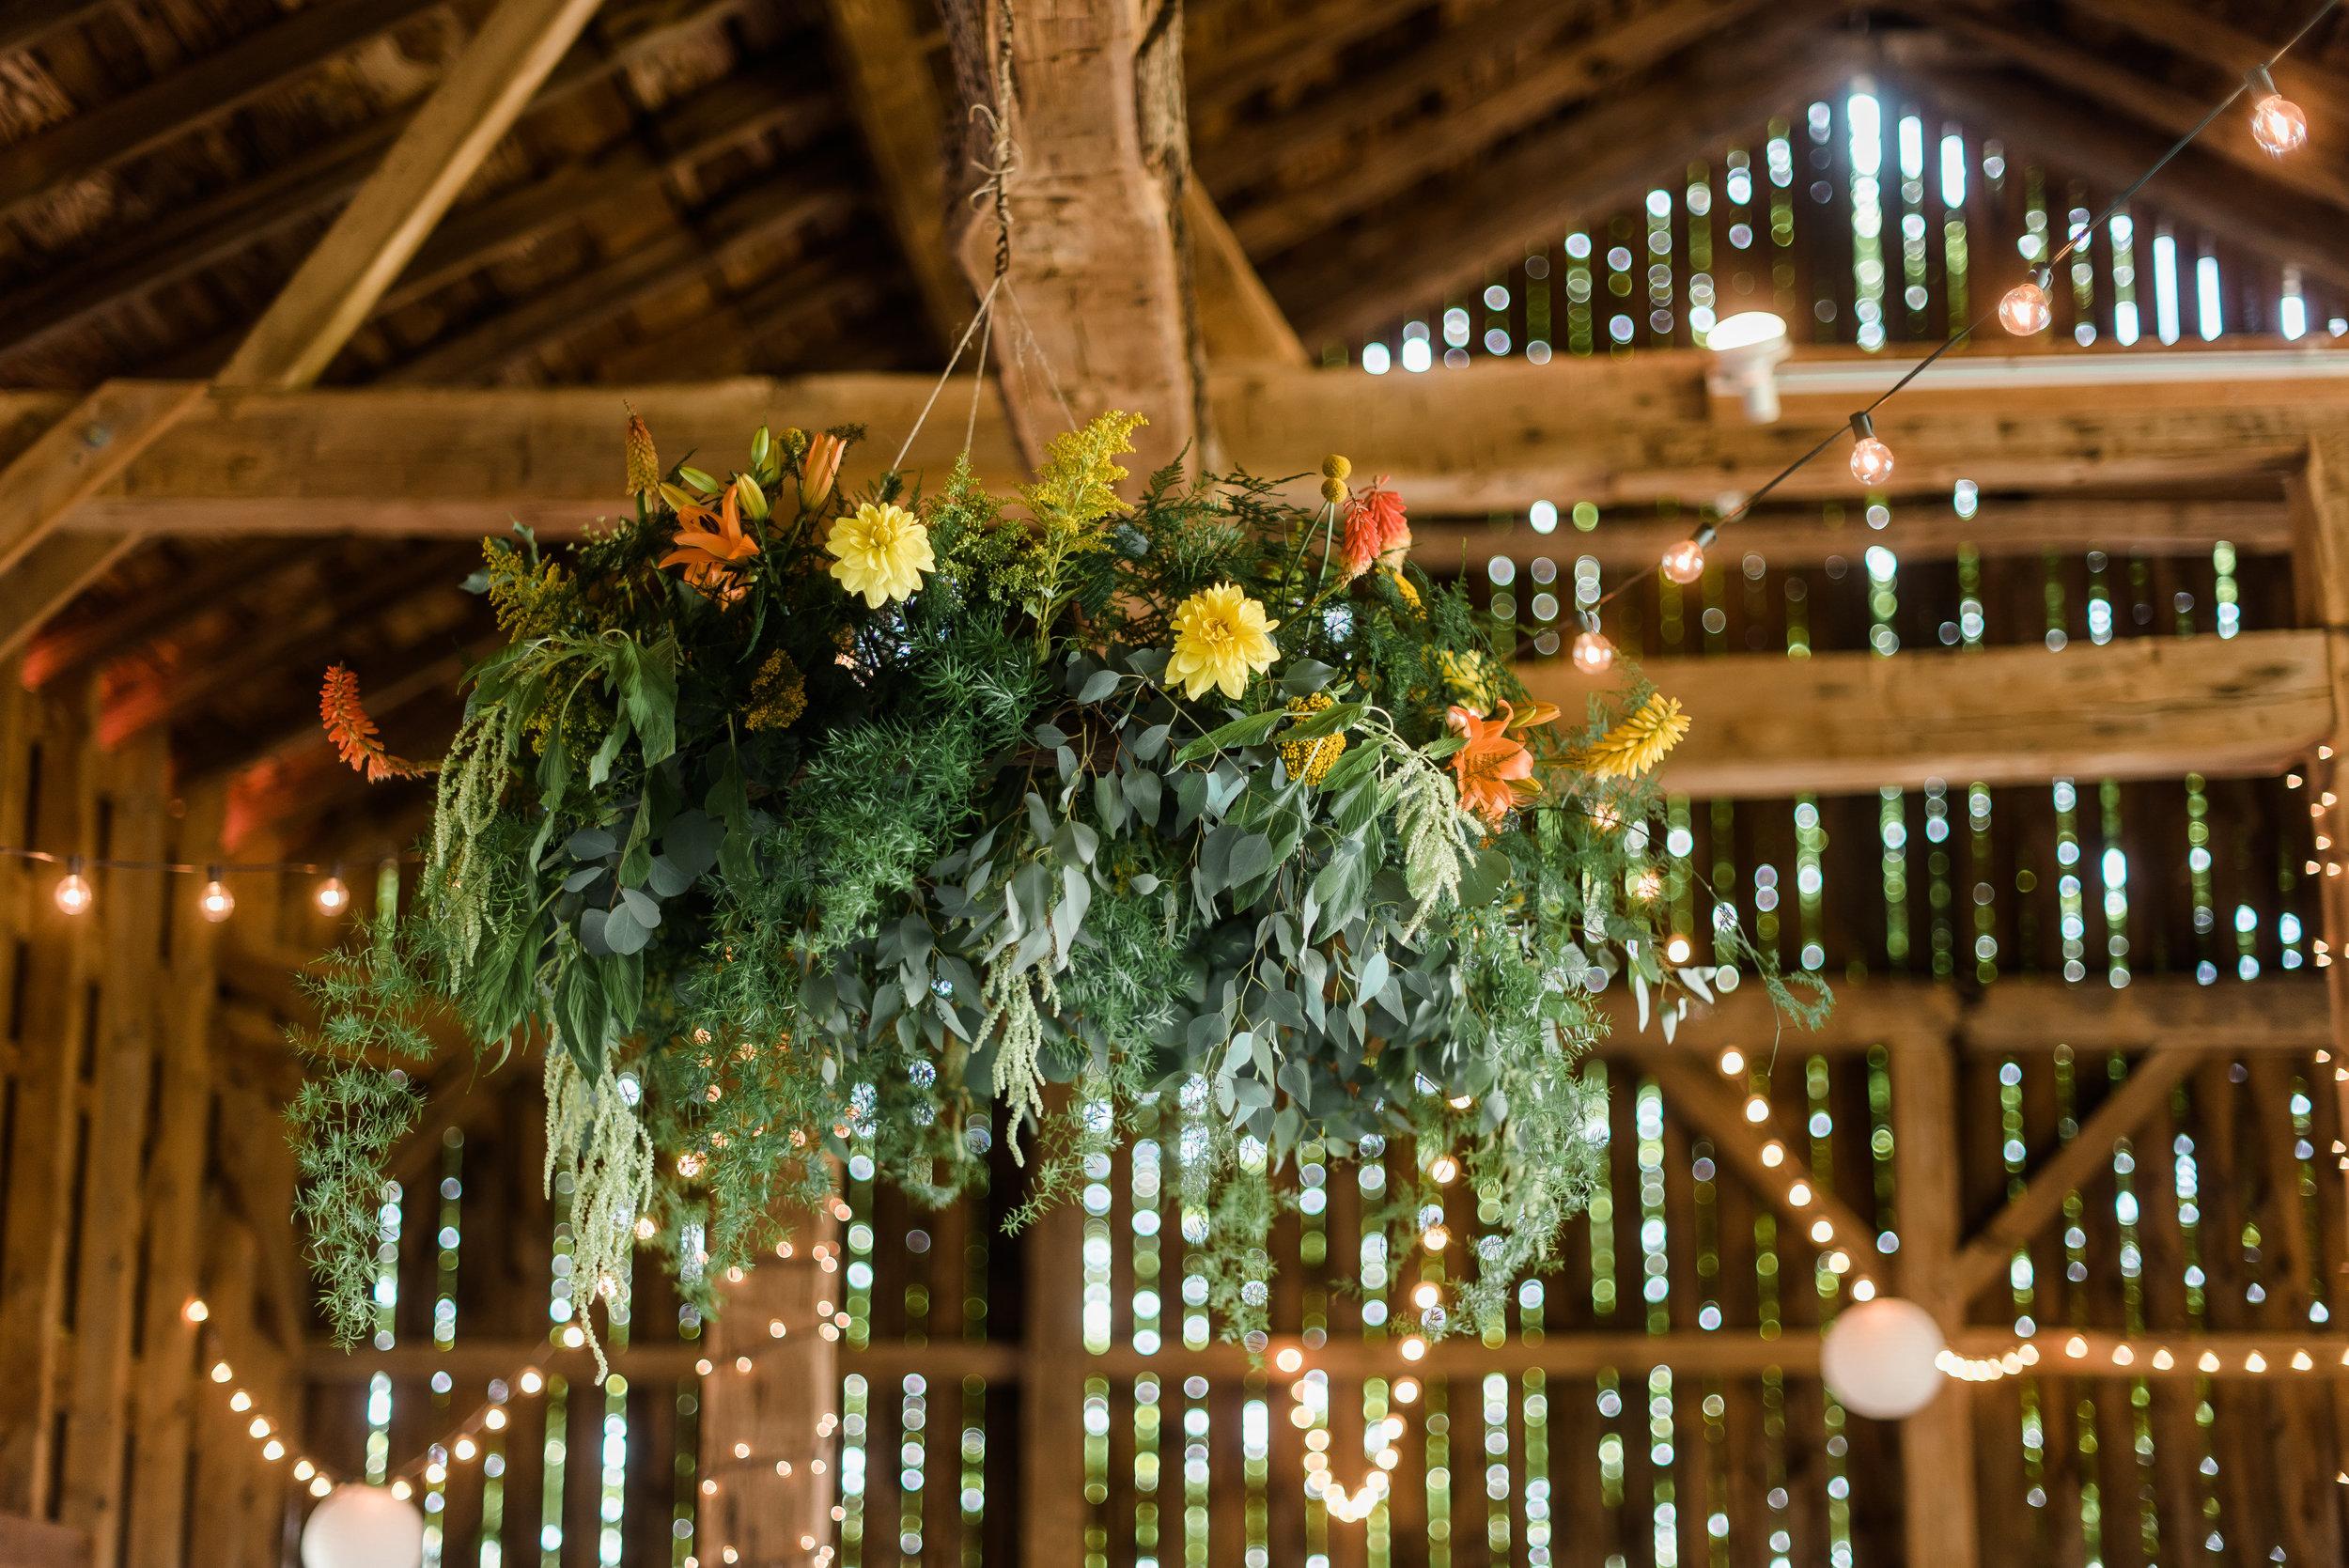 pittsburgh-wedding-photographer-armstrongfarms-eclectic-offbeat-boho0148.jpg